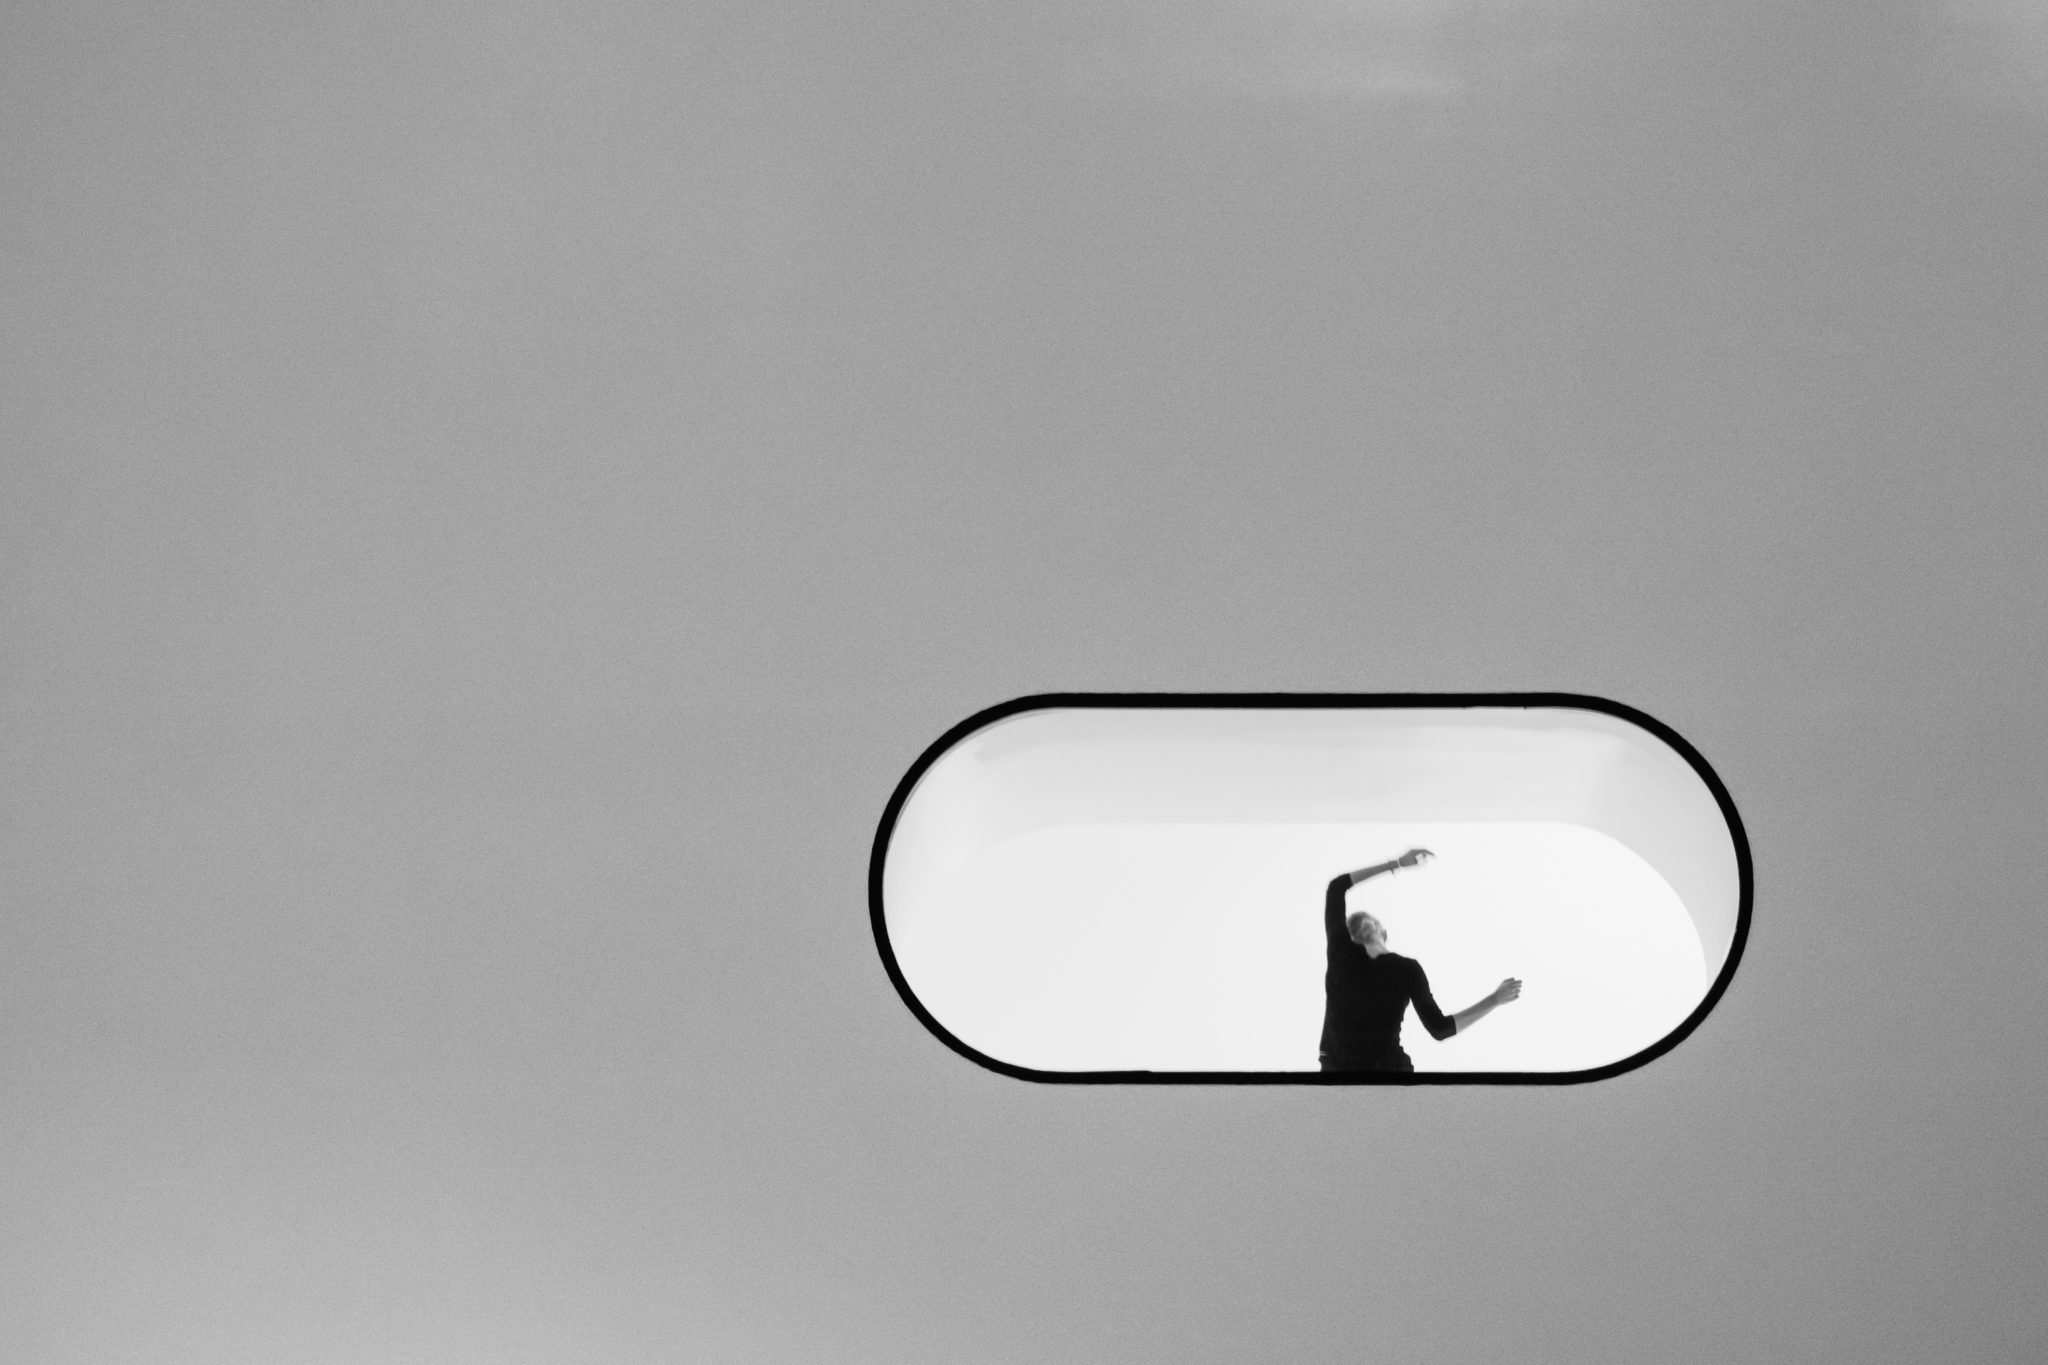 querformat-fotografie - Achim Katzberg - [GYM ● Amsterdam / October 2013]